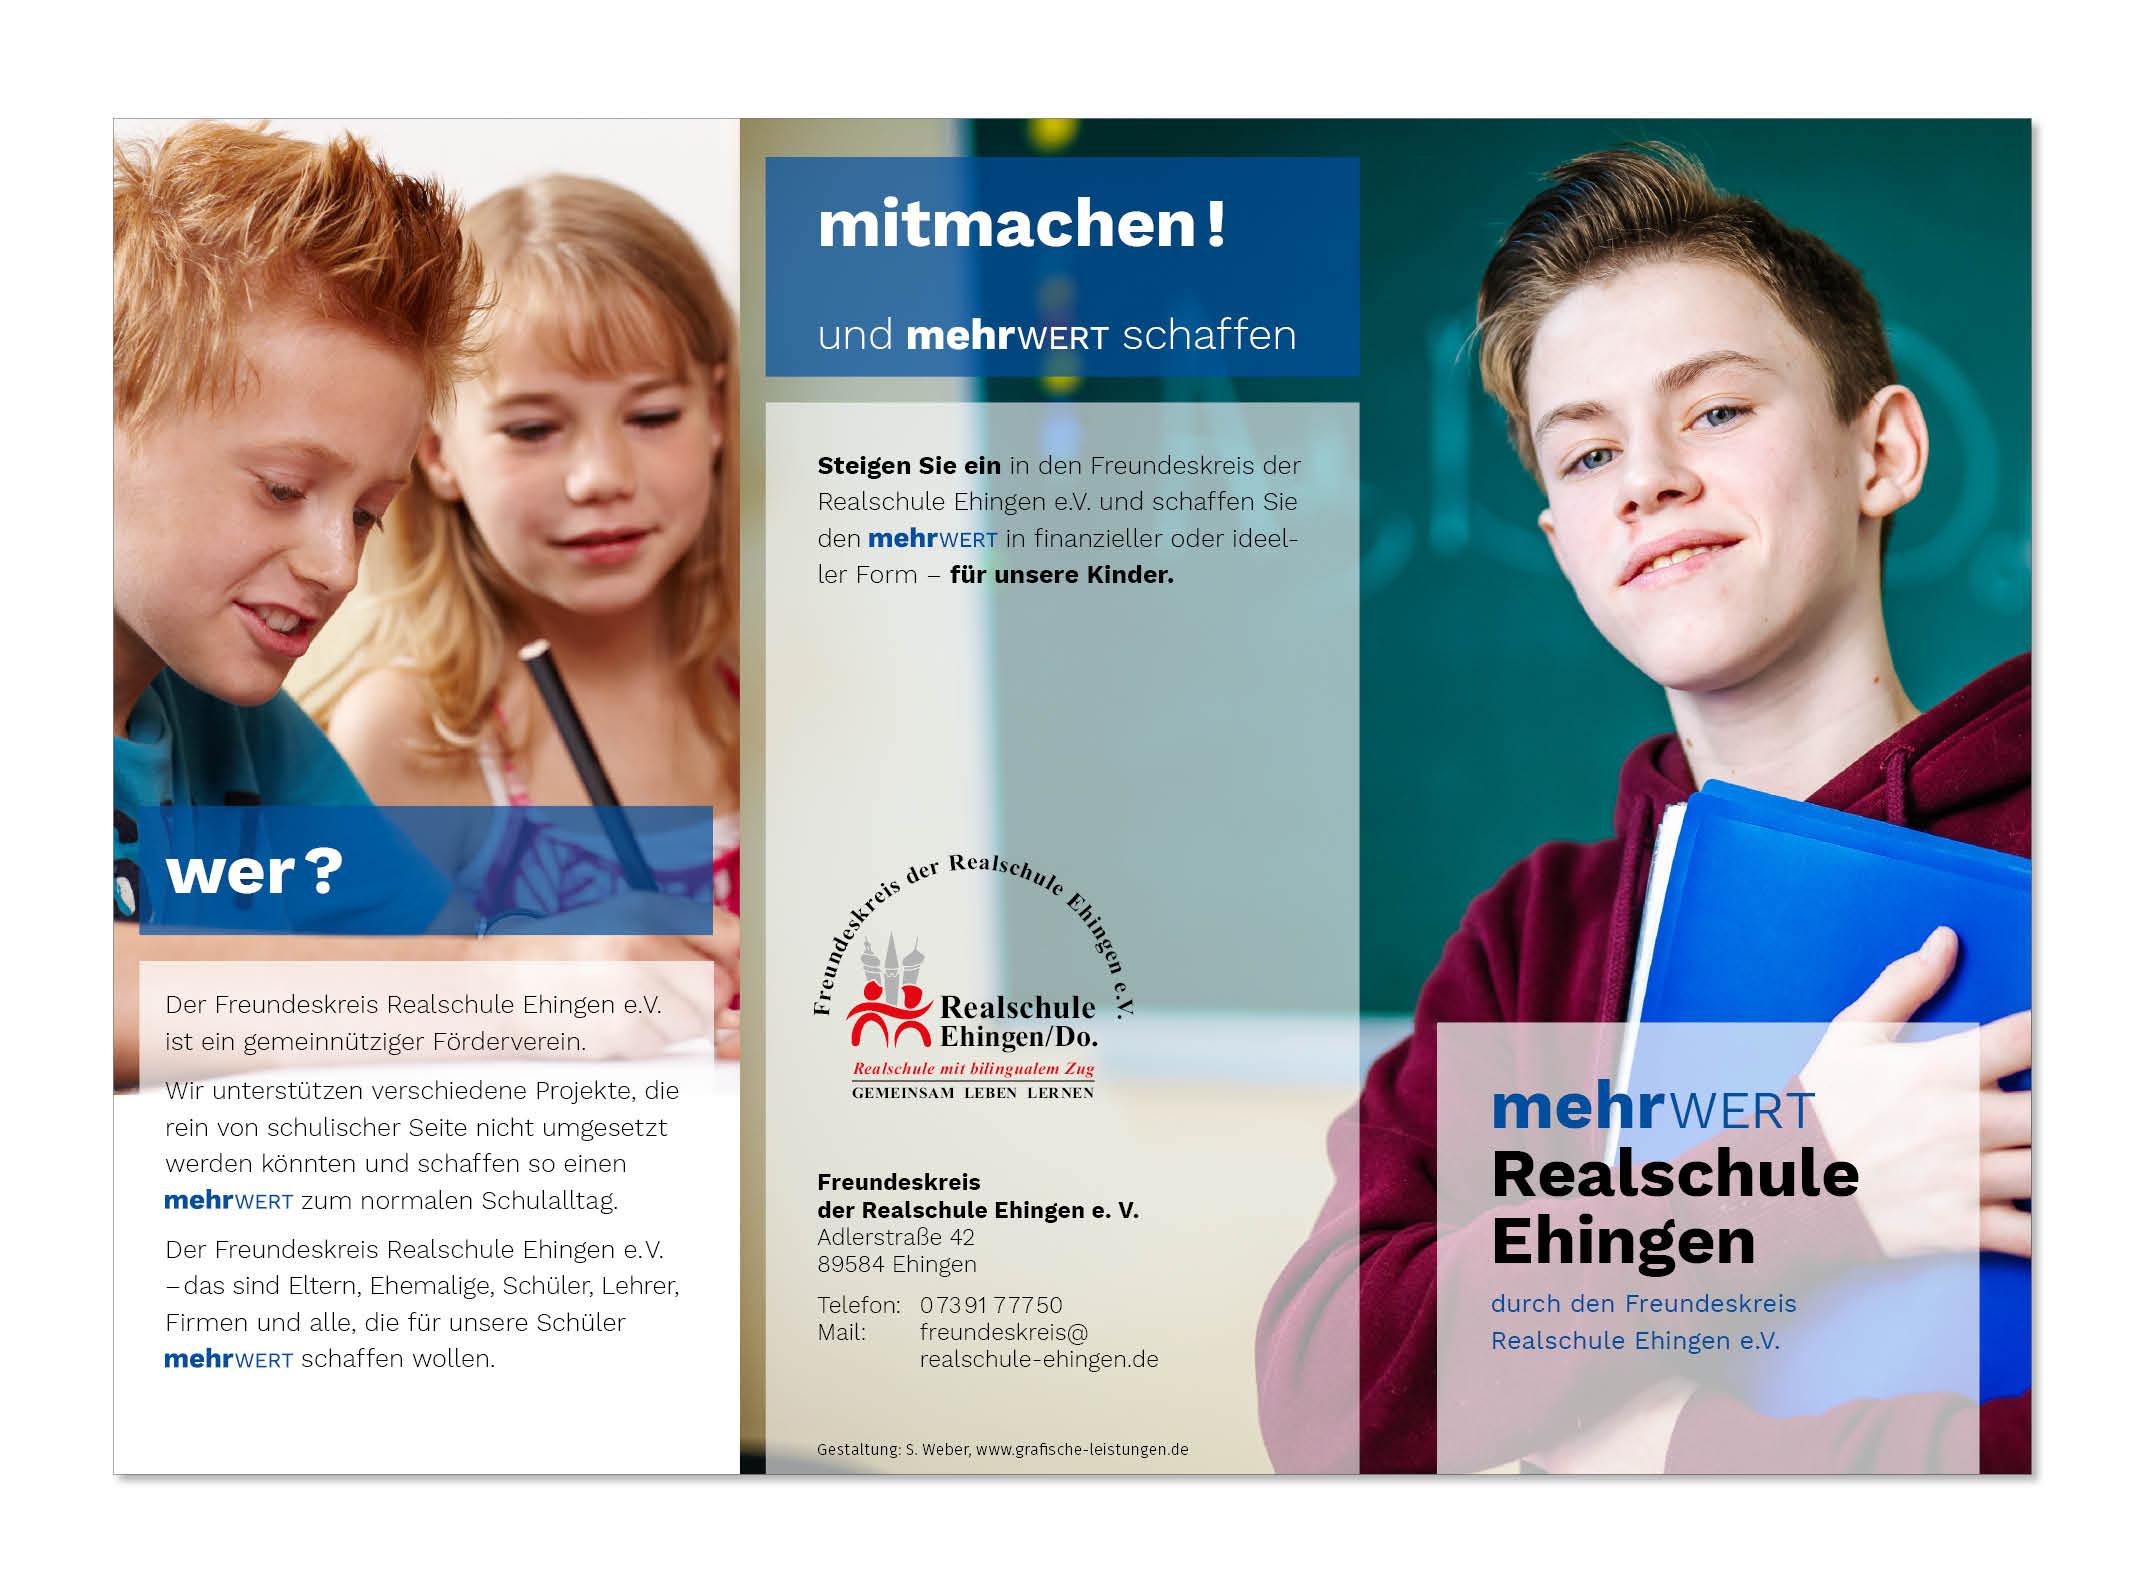 Infoflyer Freundeskreis Realschule Ehingen